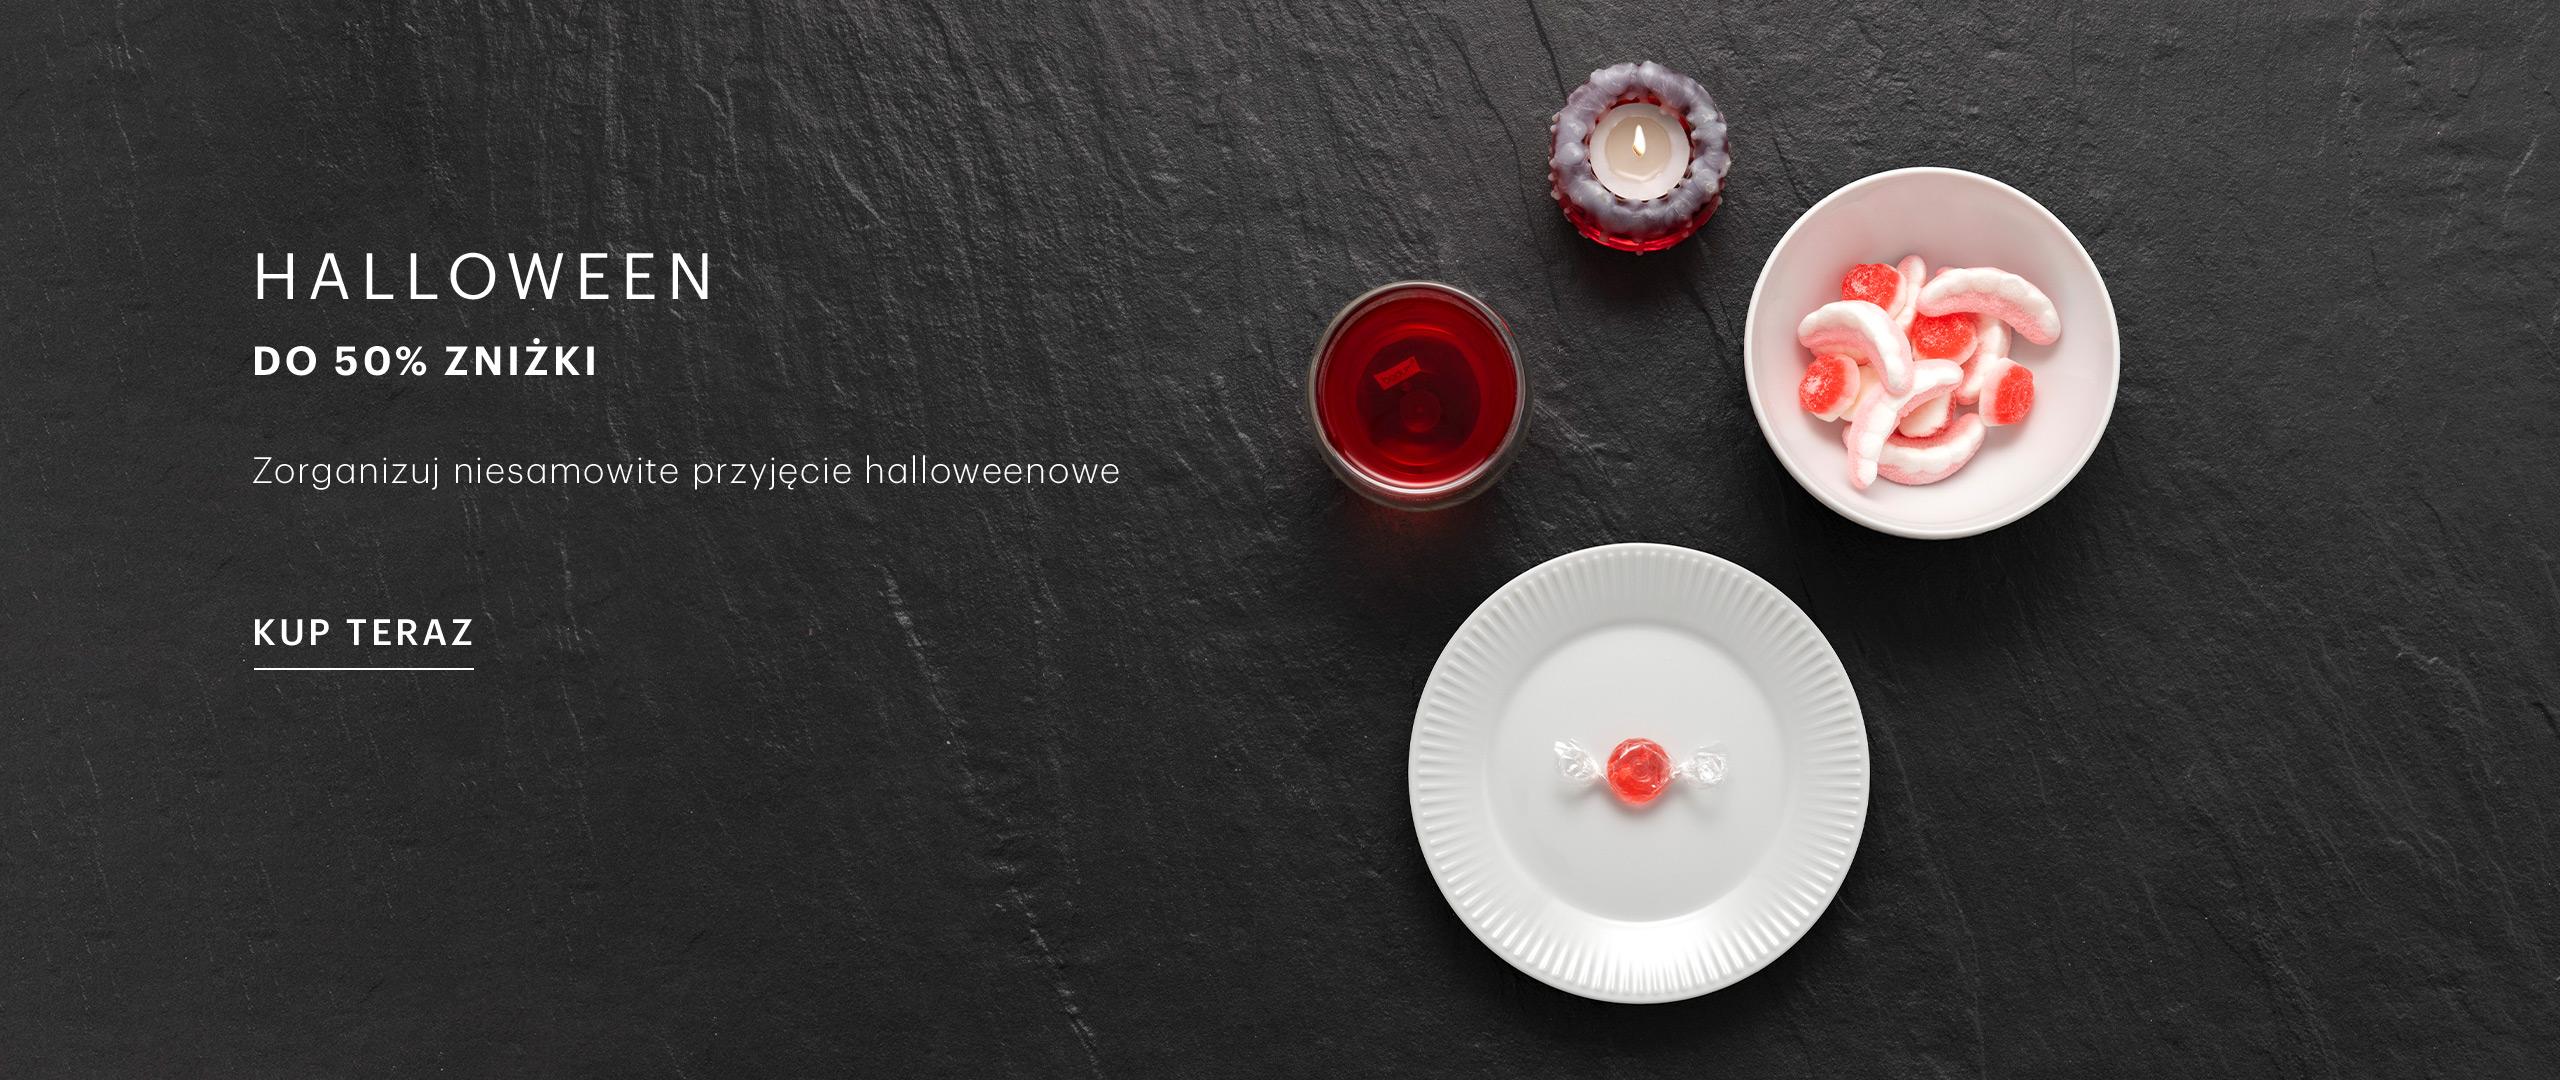 BEU [PL] - Halloween